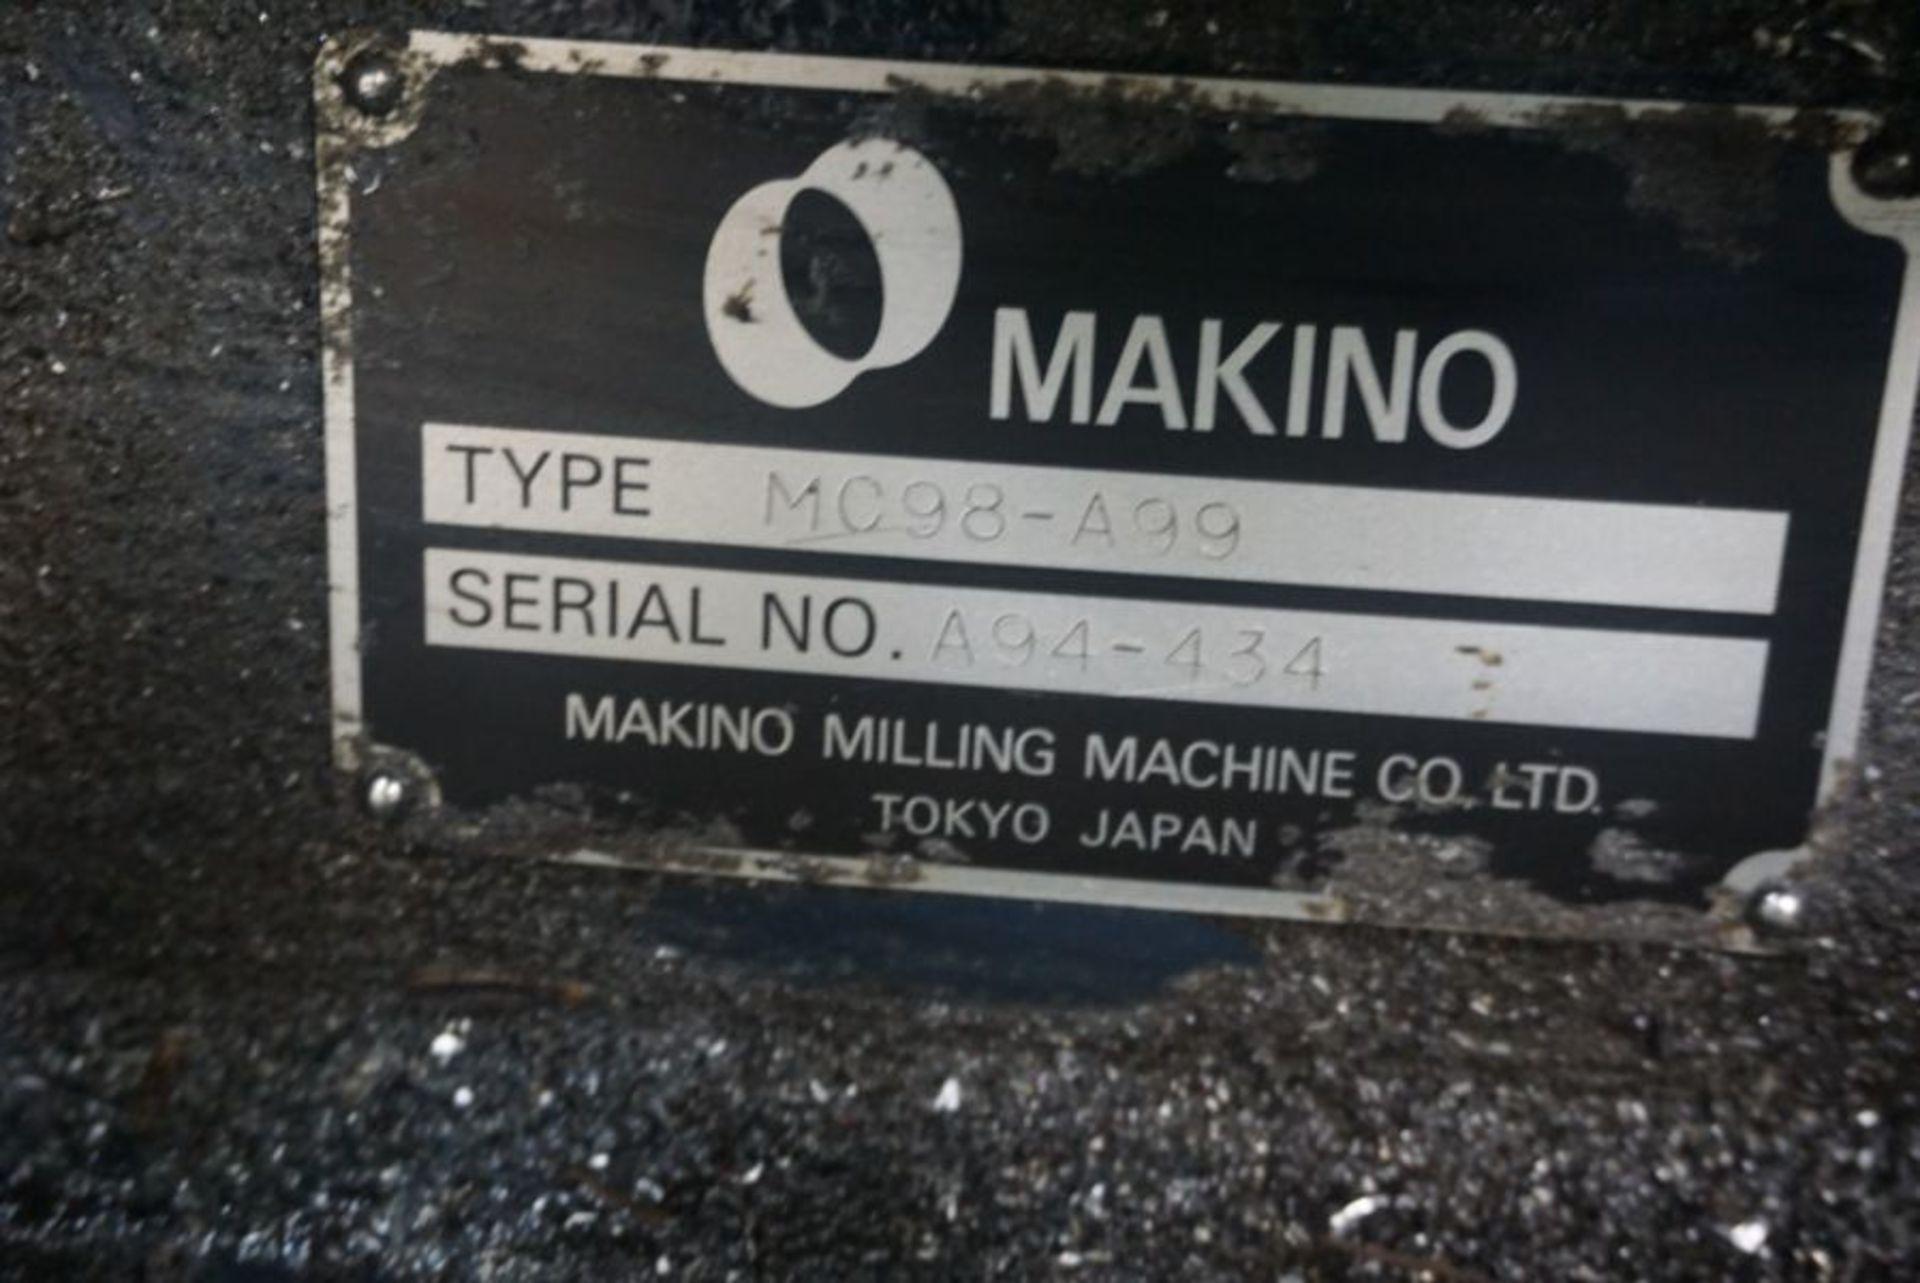 Makino MC98-A99 4-Axis Horizontal Machining Center, Fanuc 16 Pro 3 Control, New 1991 - Image 8 of 8